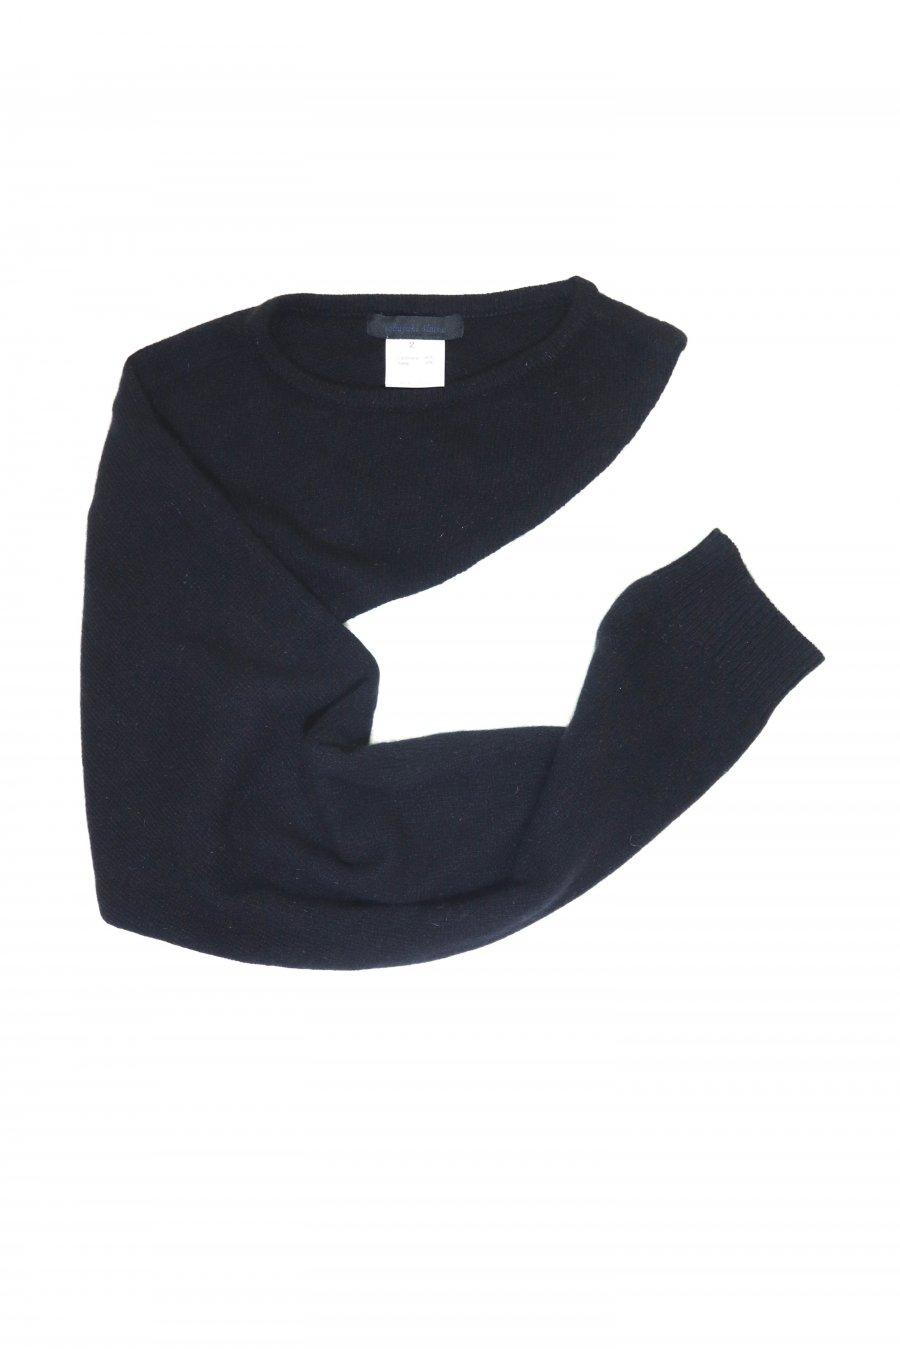 Nobuyuki Matsui  Sable one side sleeve (BLACK)<img class='new_mark_img2' src='https://img.shop-pro.jp/img/new/icons15.gif' style='border:none;display:inline;margin:0px;padding:0px;width:auto;' />